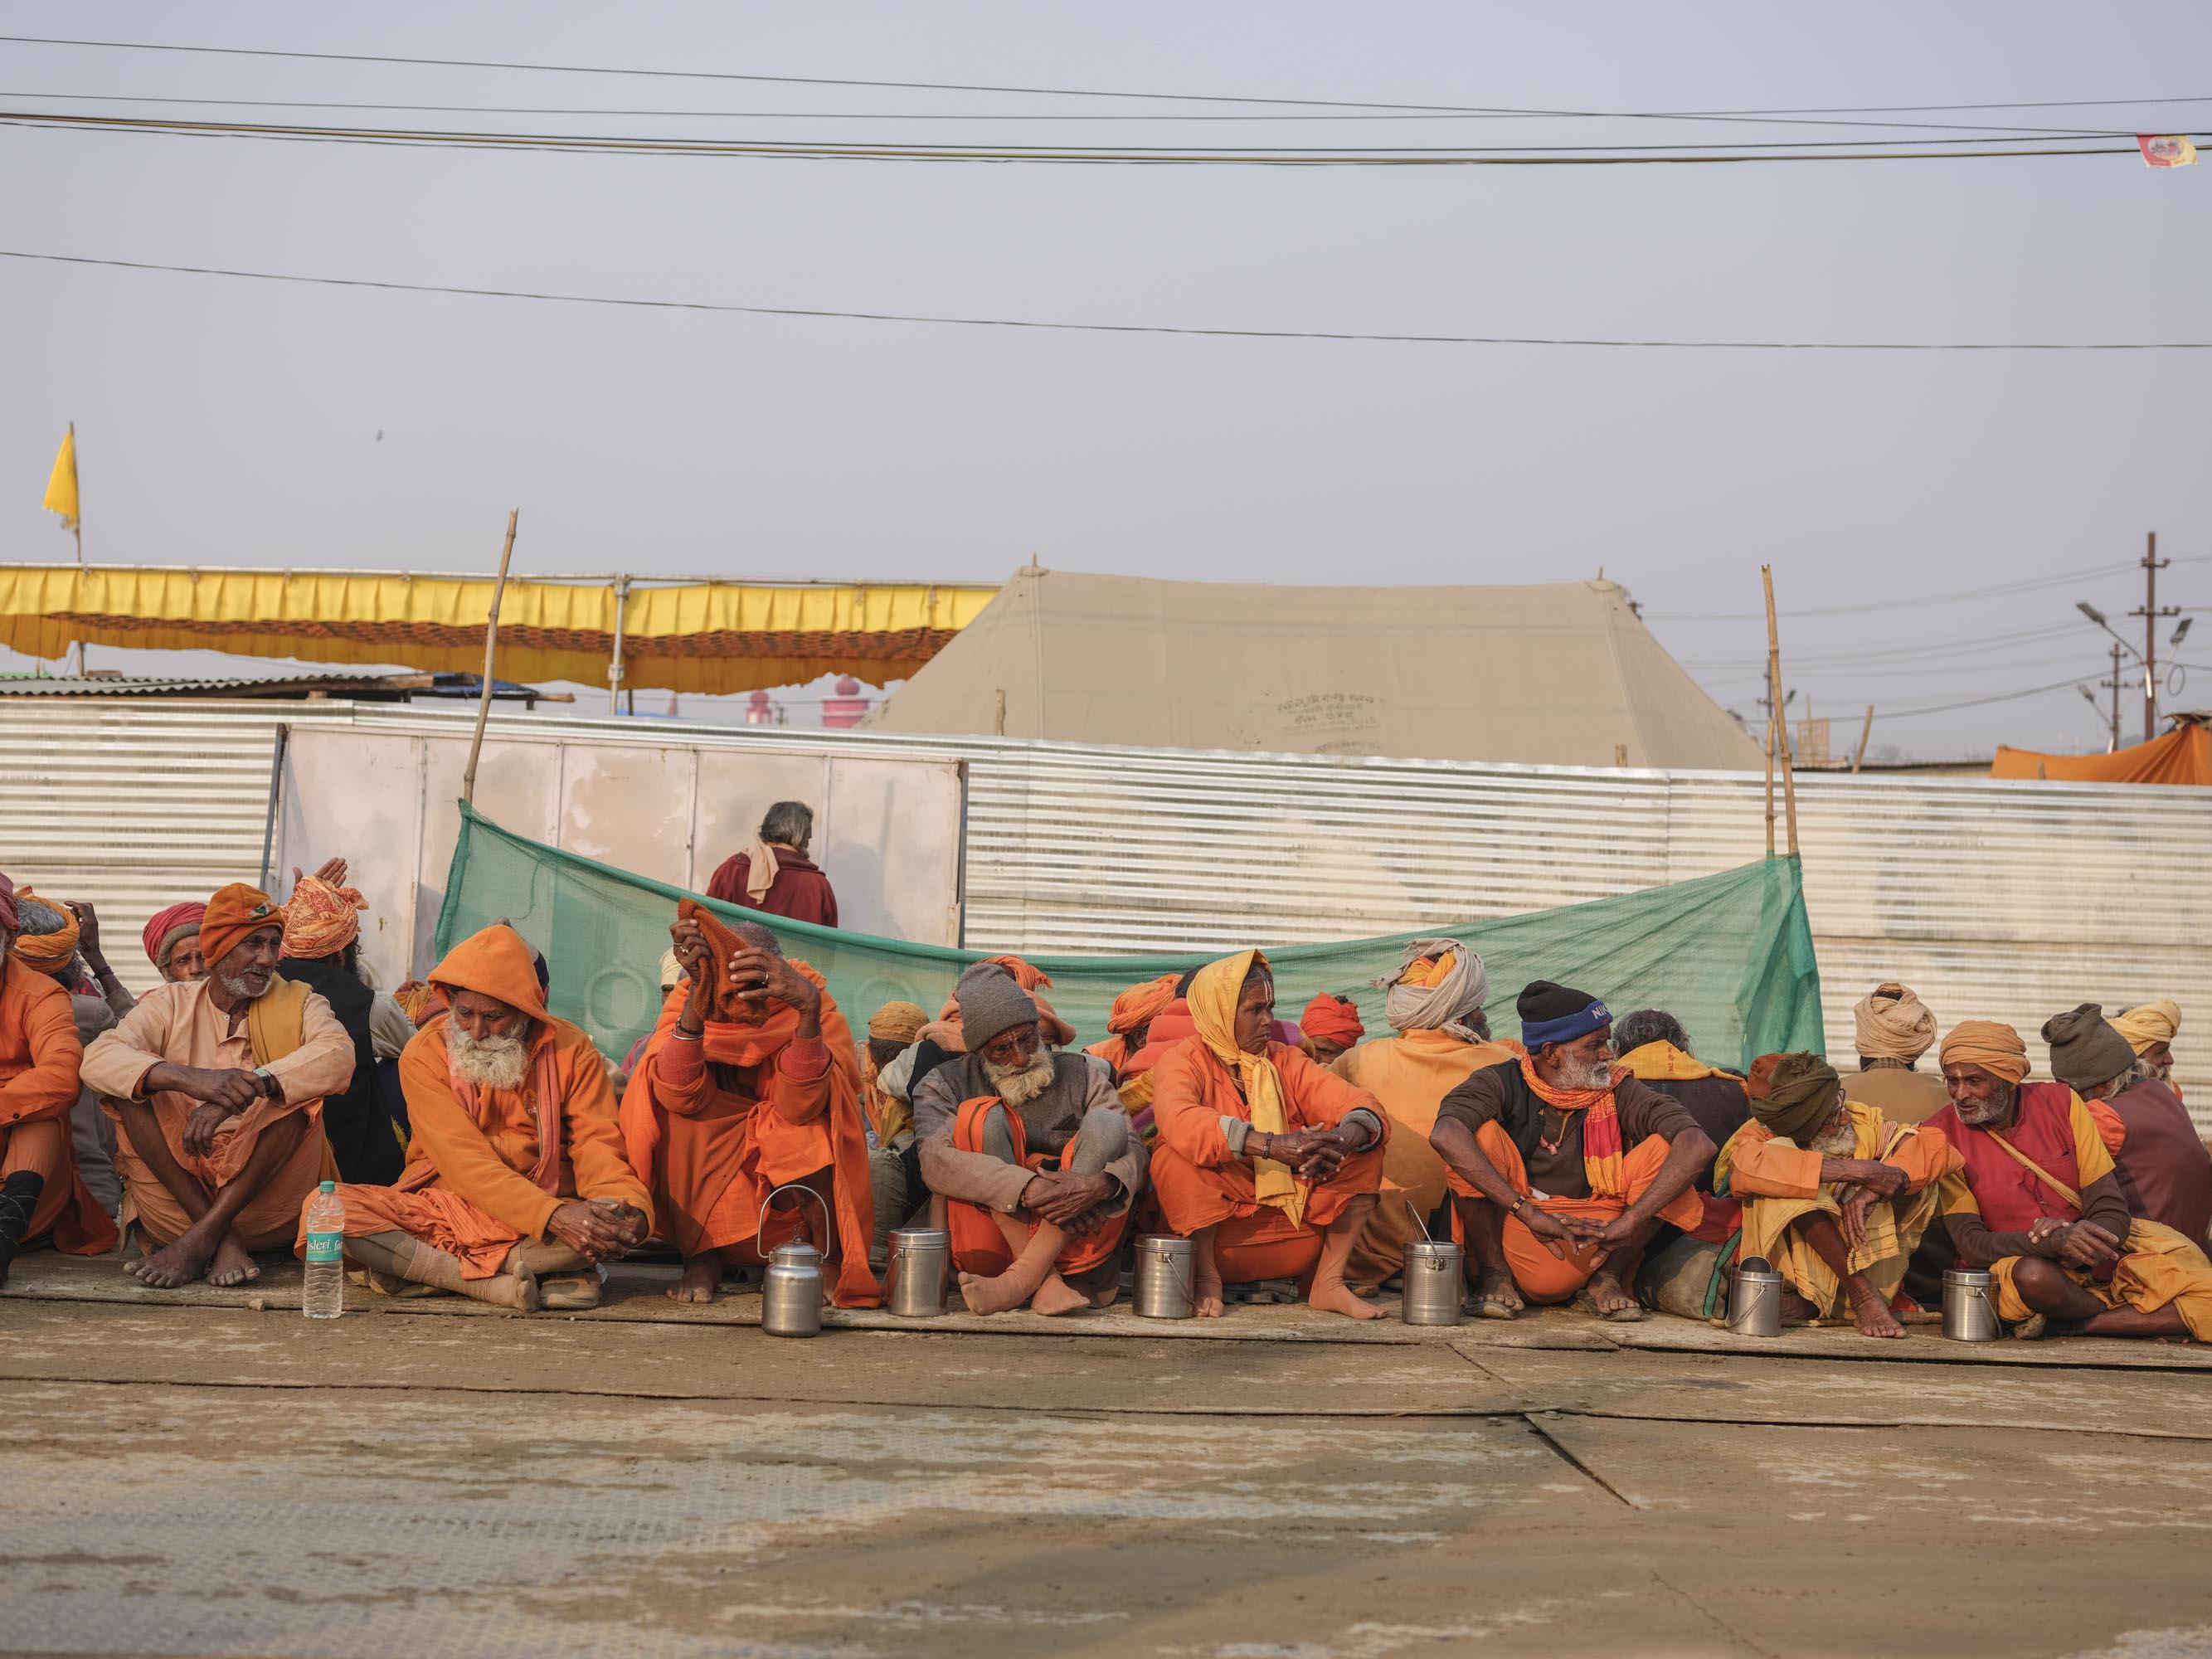 offering meal temple people pilgrims Kumbh mela 2019 India Allahabad Prayagraj Ardh hindu religious Festival event rivers photographer jose jeuland photography